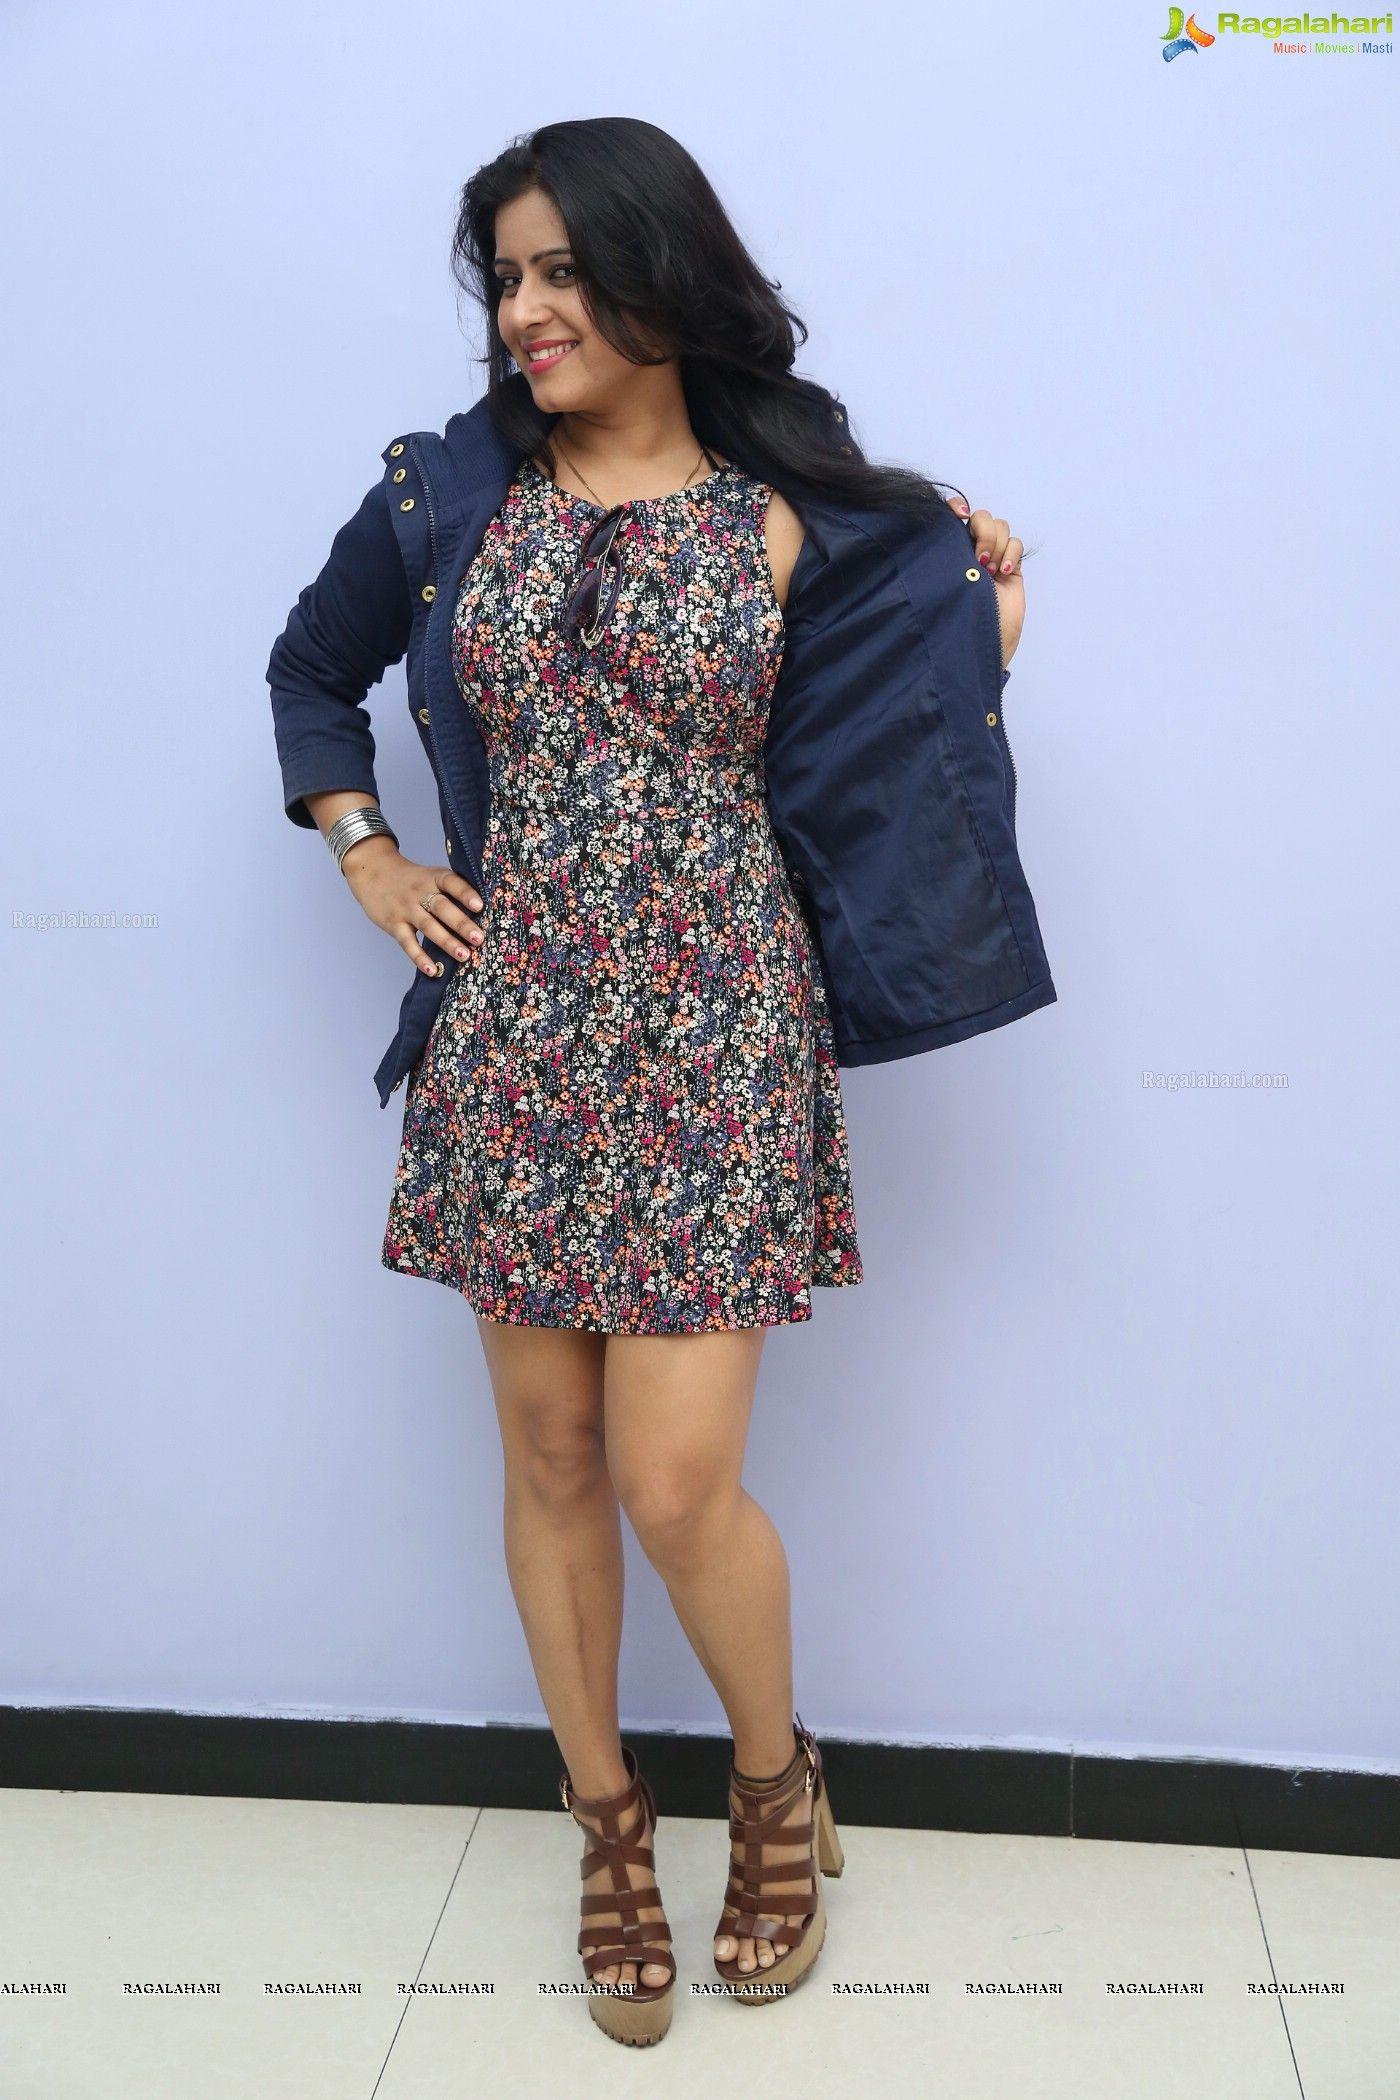 manisha thakur glam stills - image 96 | frock and mini skirt, the